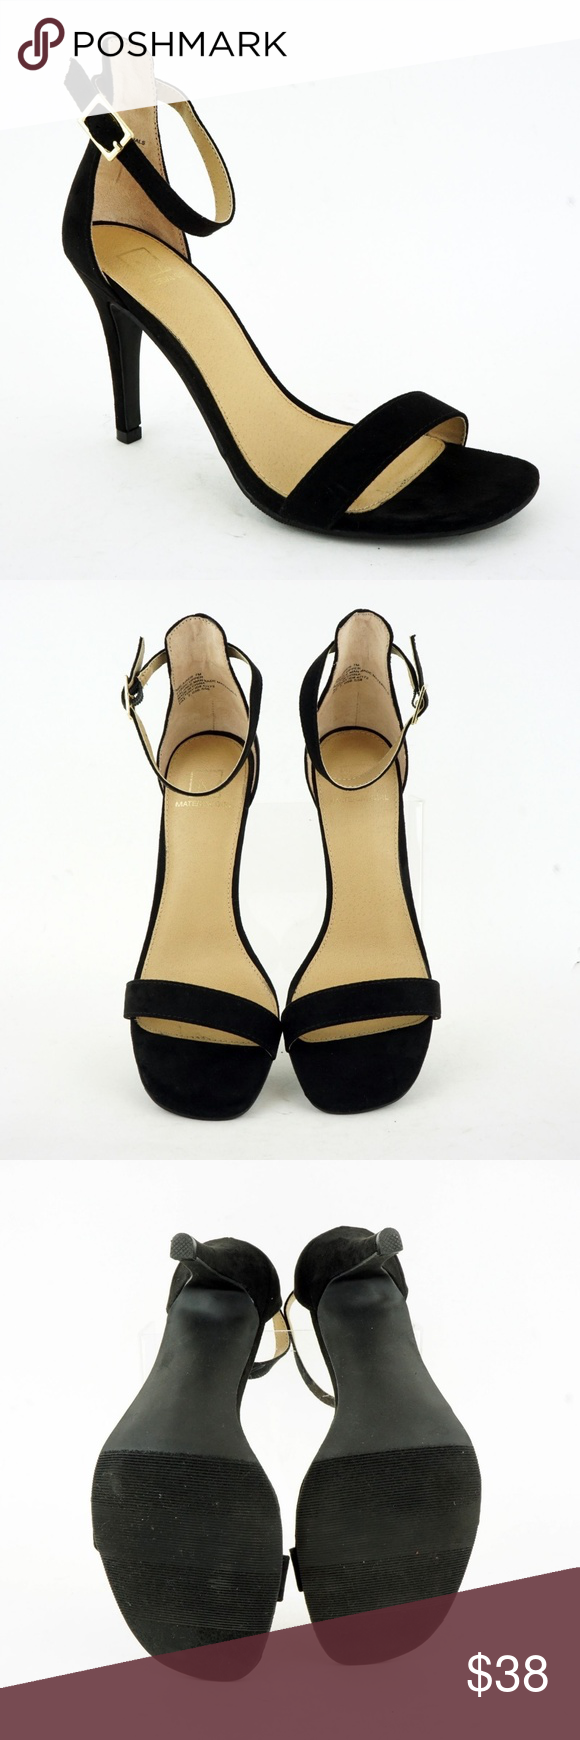 94247e79e20 Material Girl Womens Blaire Two-Piece Dress Sandal Material Girl Women s  (Sz 7) Blaire Two-Piece Dress Sandals